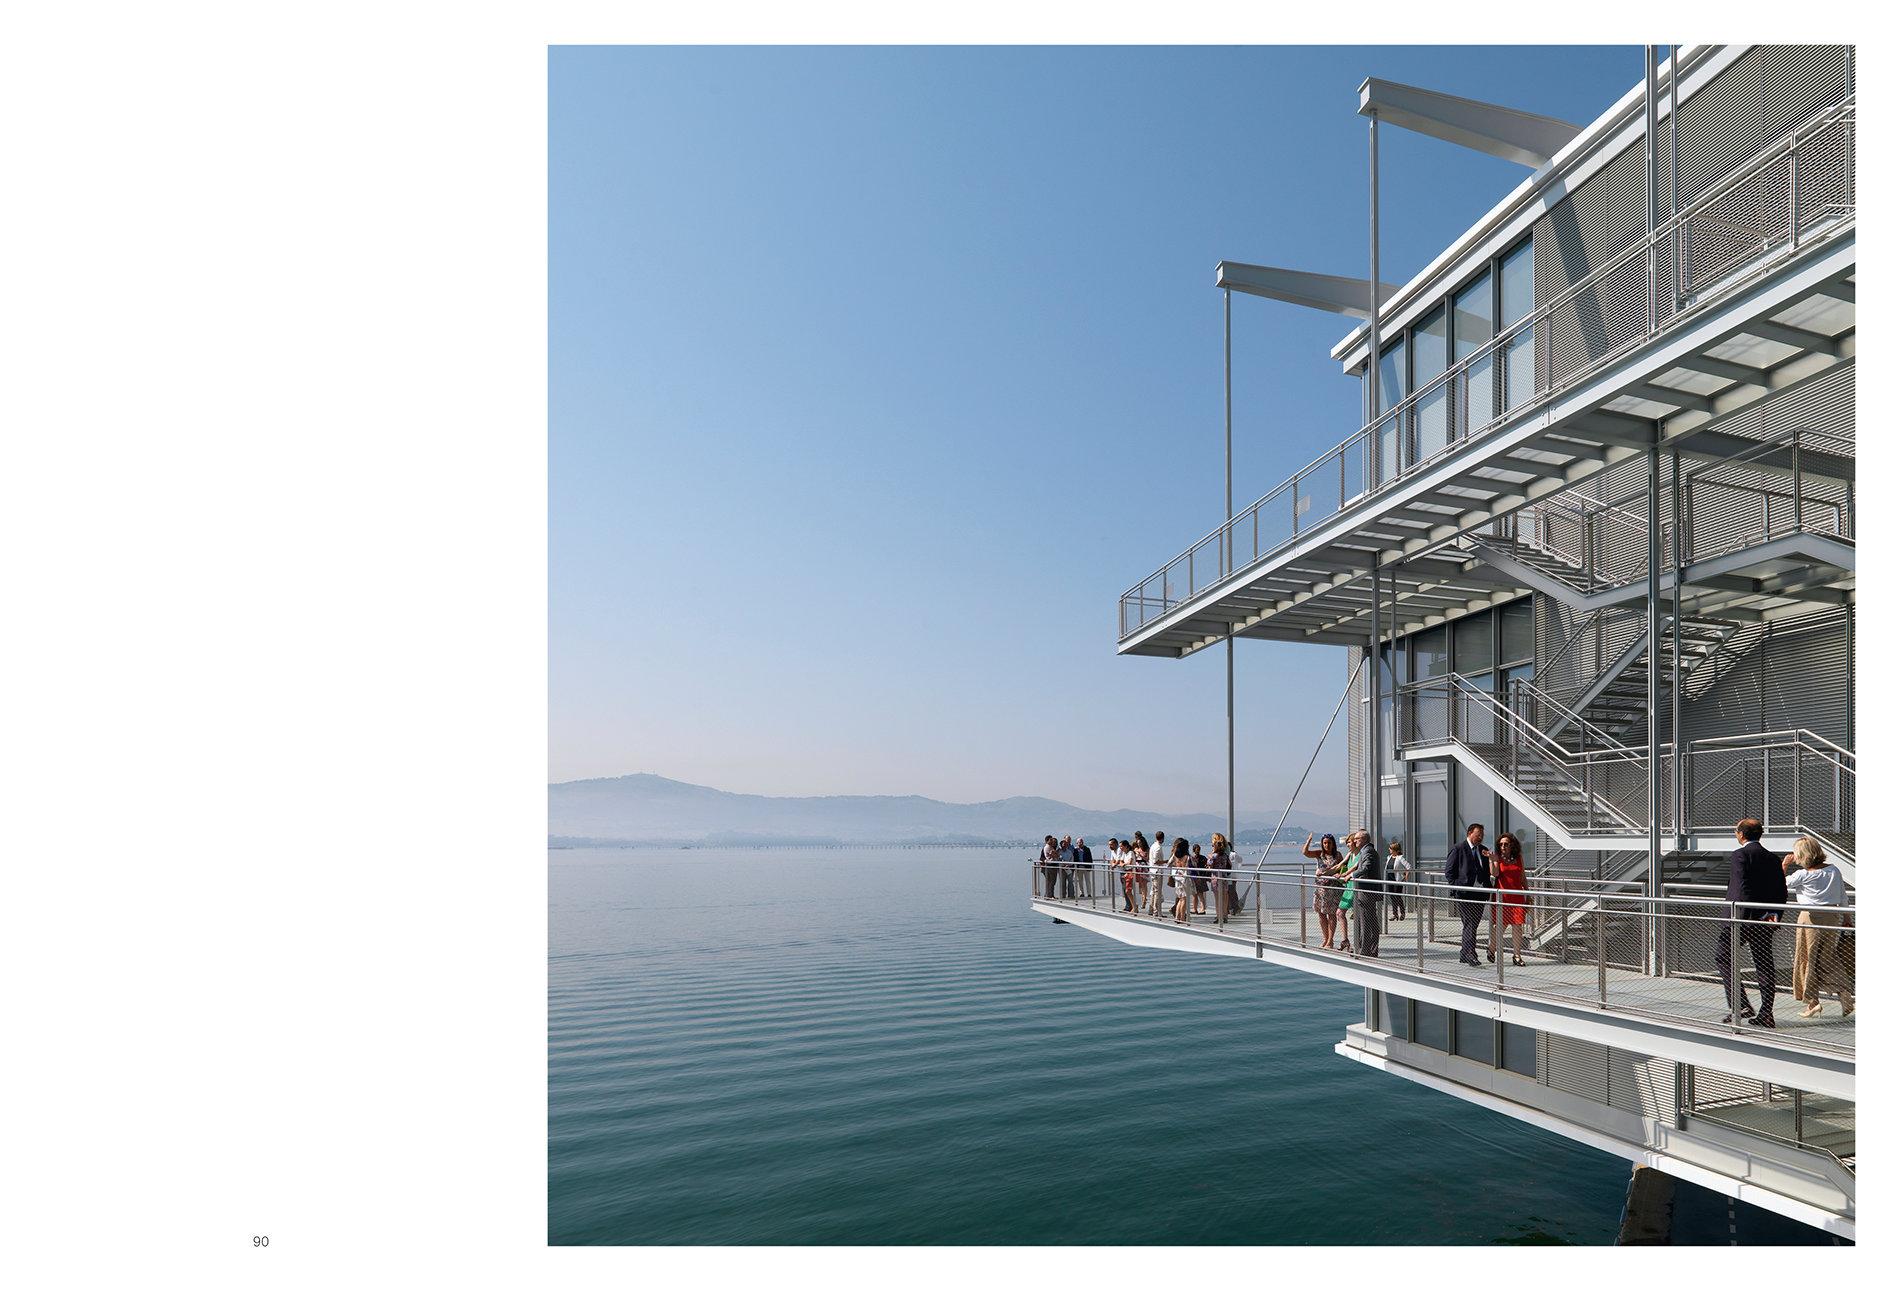 Renzo Piano: The Art of Making Buildings